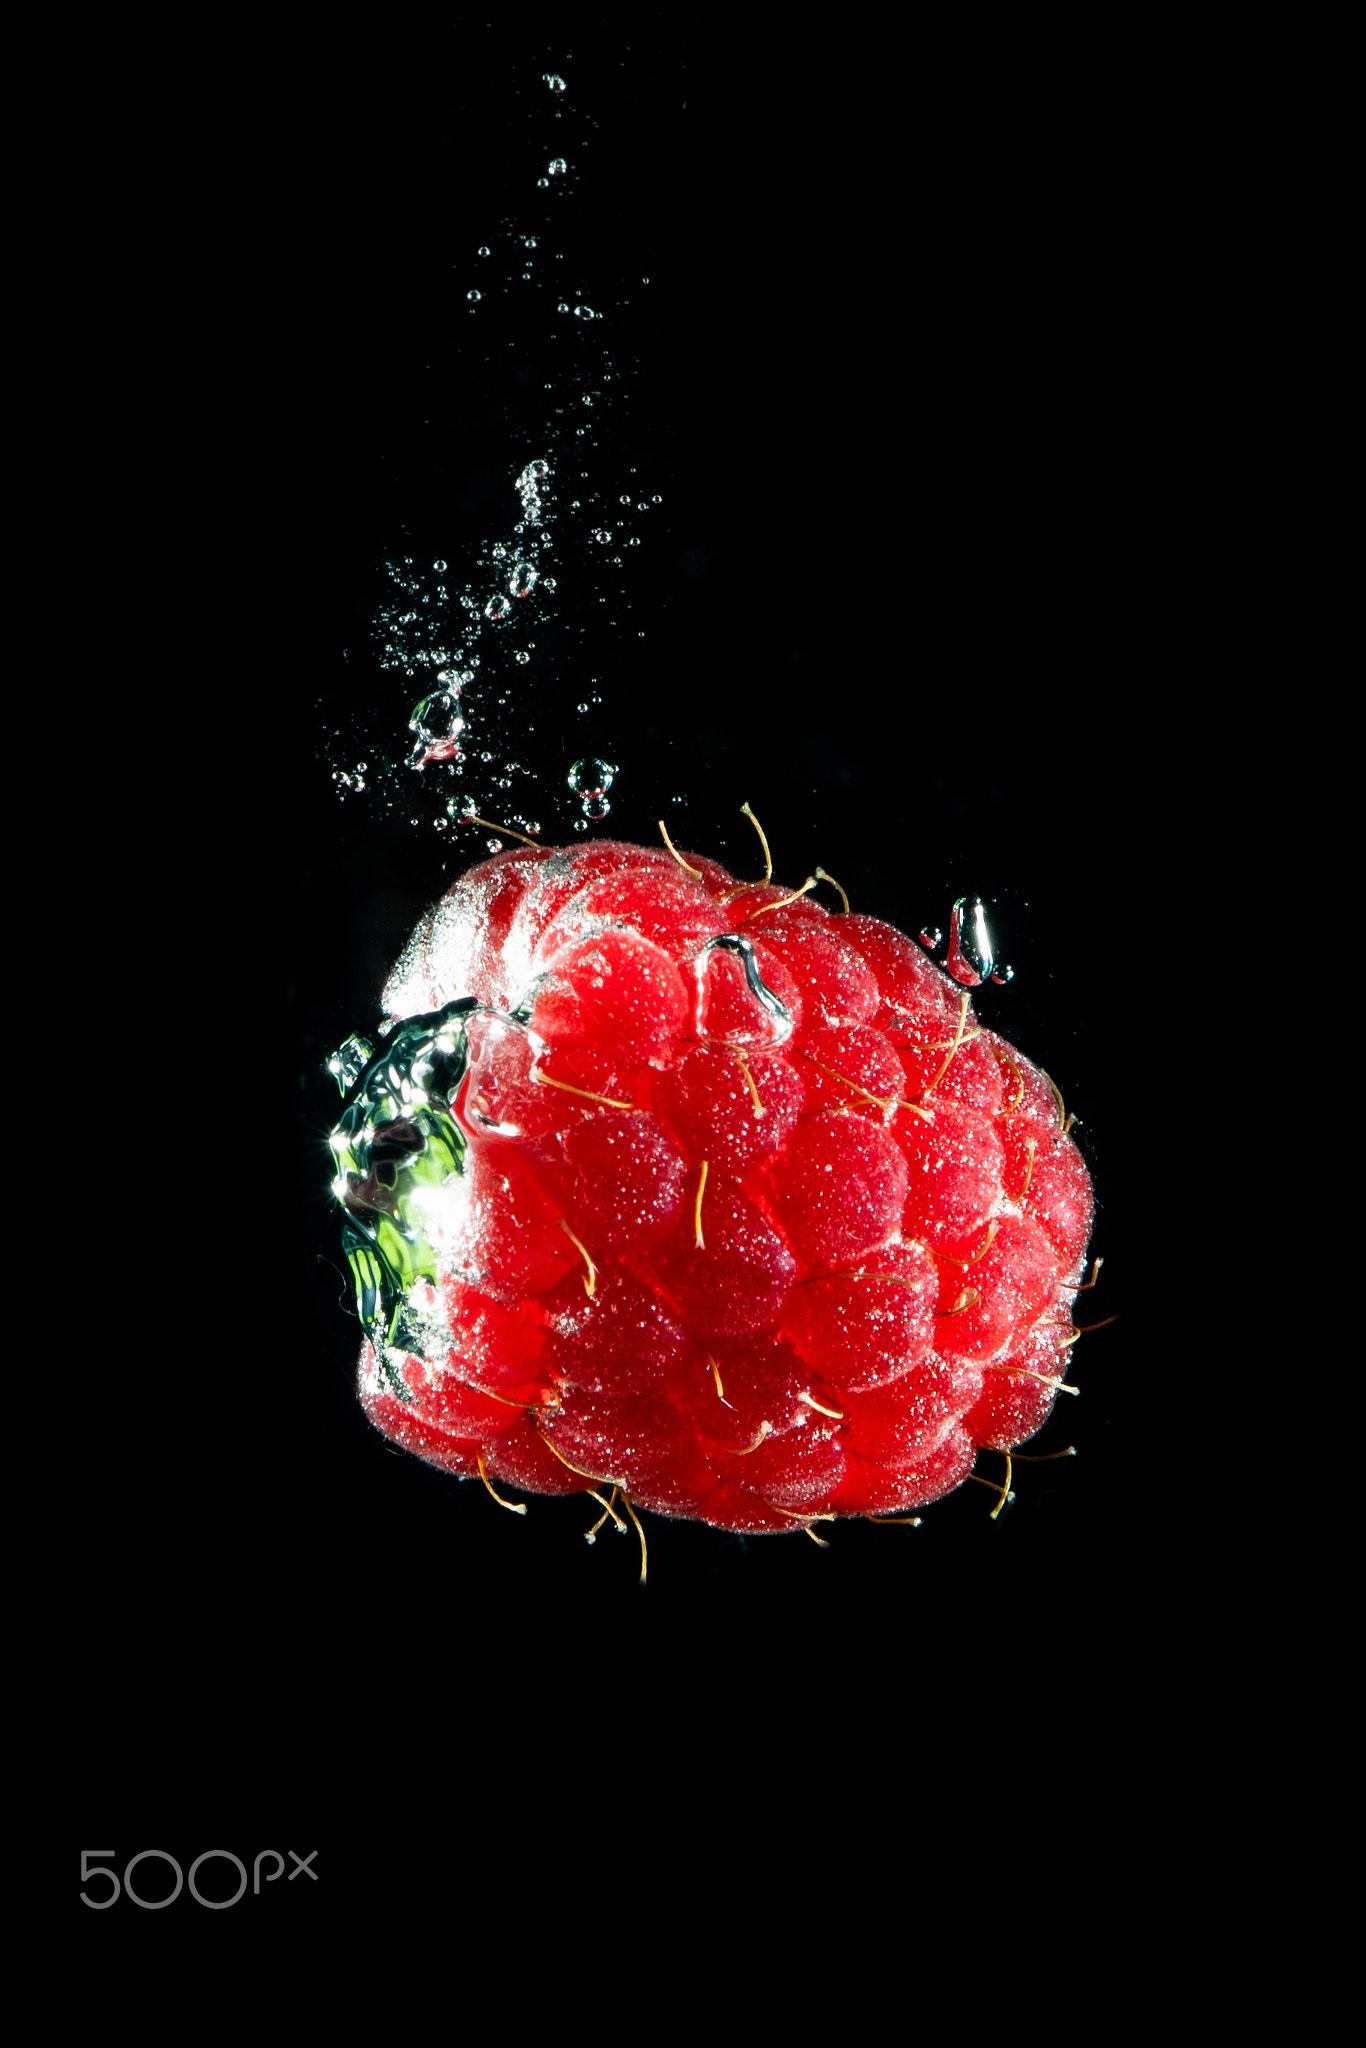 Fresh berry falling in water